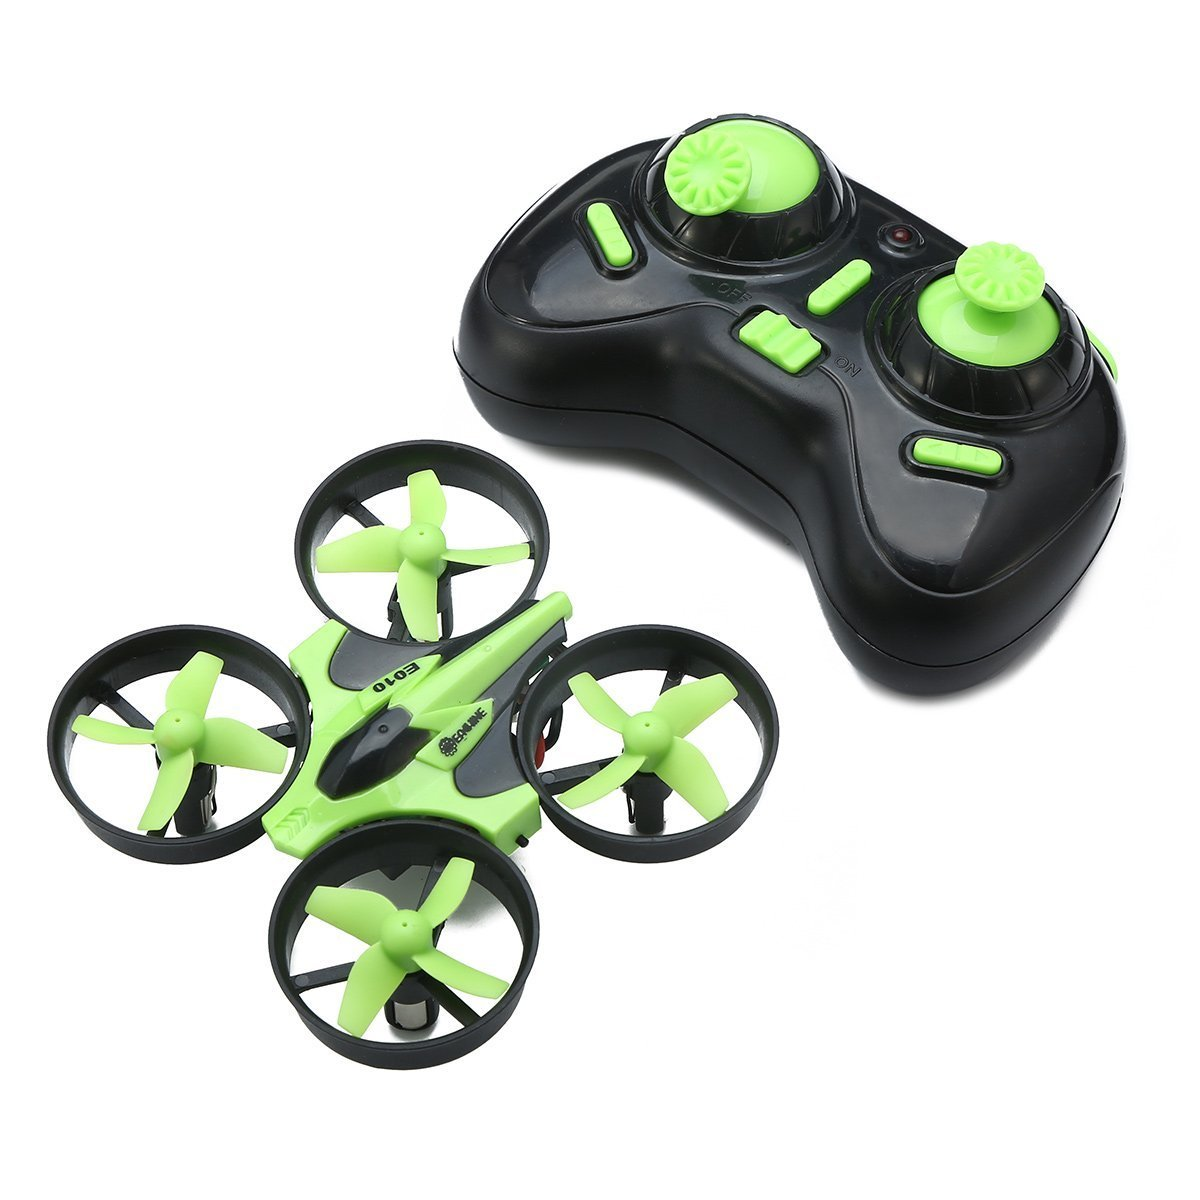 EACHINE Mini Quadcopter Drone, E010 2.4GHz 6-Axis Gyro Remote Control Nano Drone for Beginners Adults - Headless Mode, 3D Flip, One Key Return (Green)